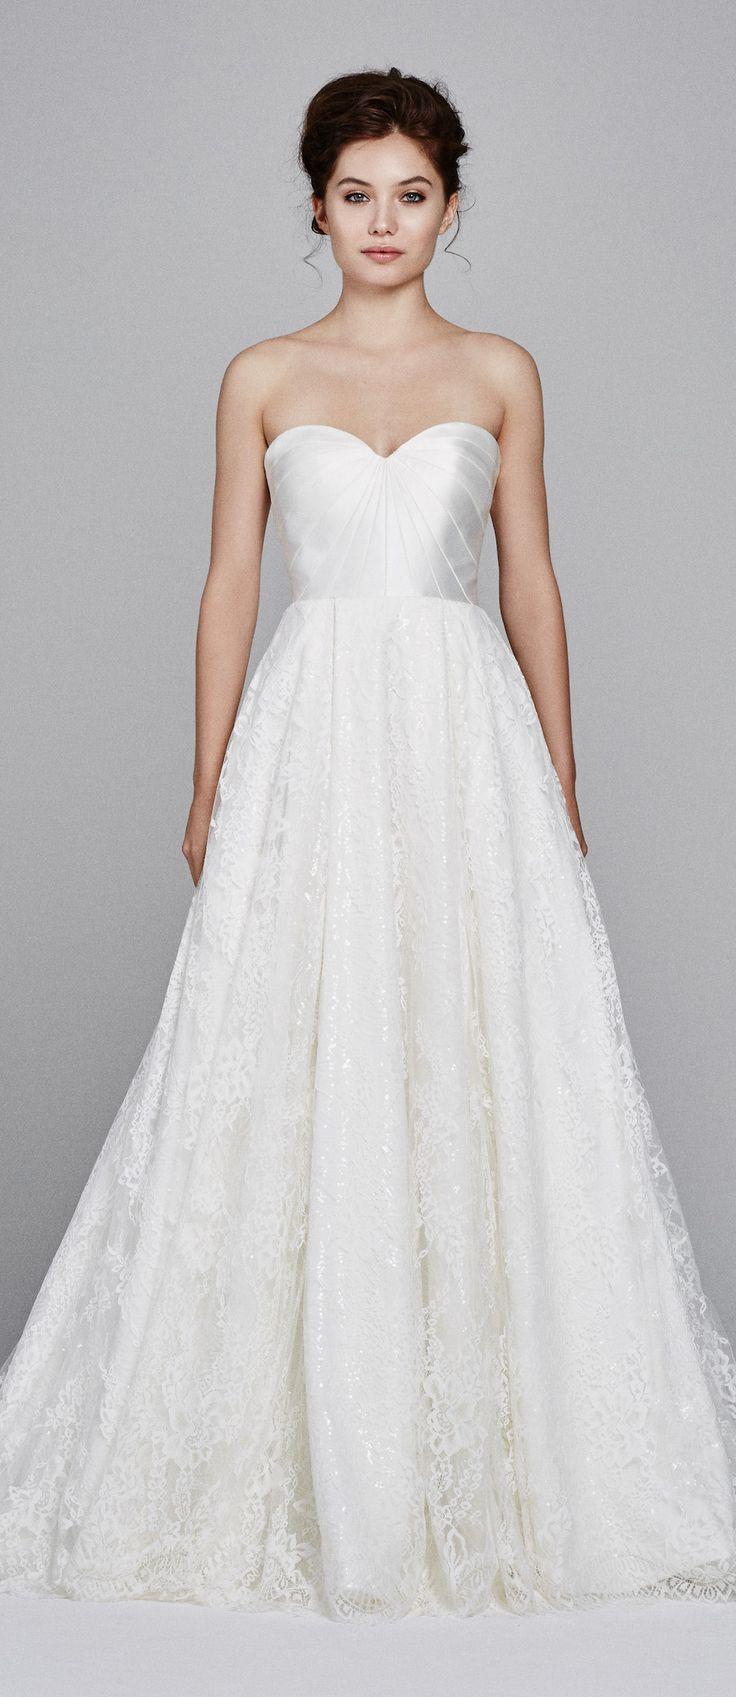 wedding dresses wedding dress with straps Wedding Dress by Kelly Faetanini Fall